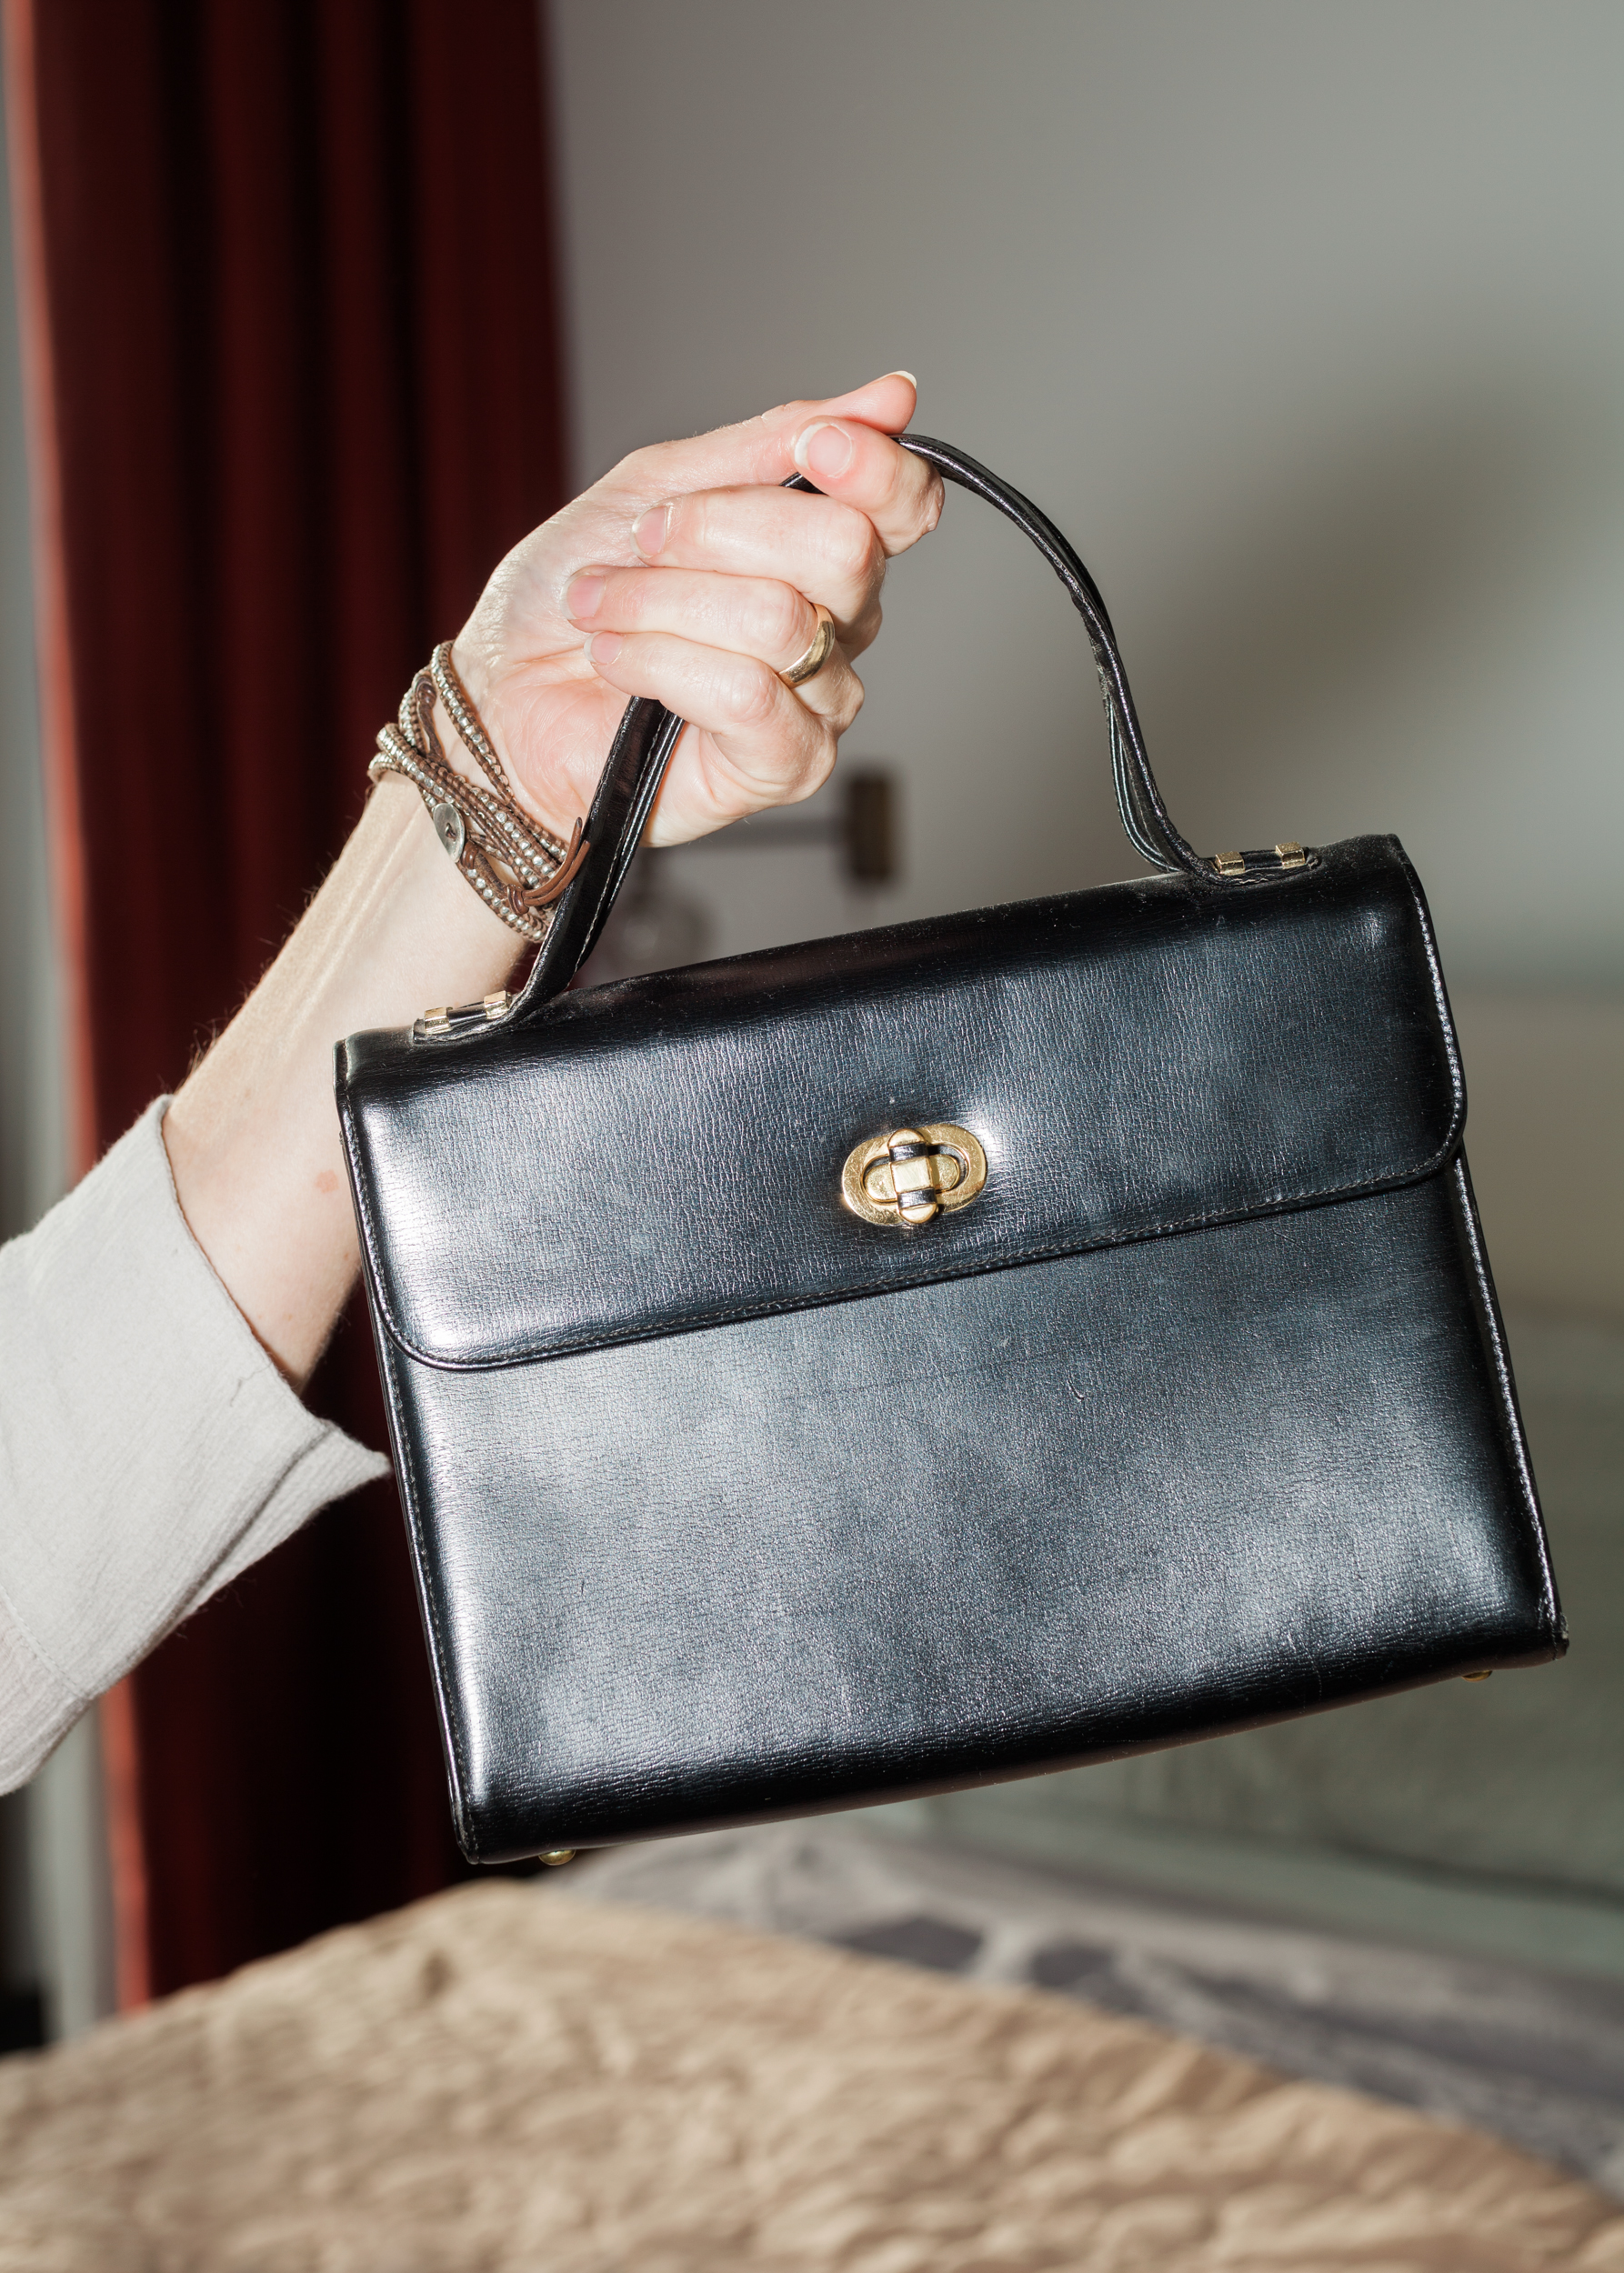 Bracelet, Chan Luu ; Bag, Vintage from Brooklyn Flea